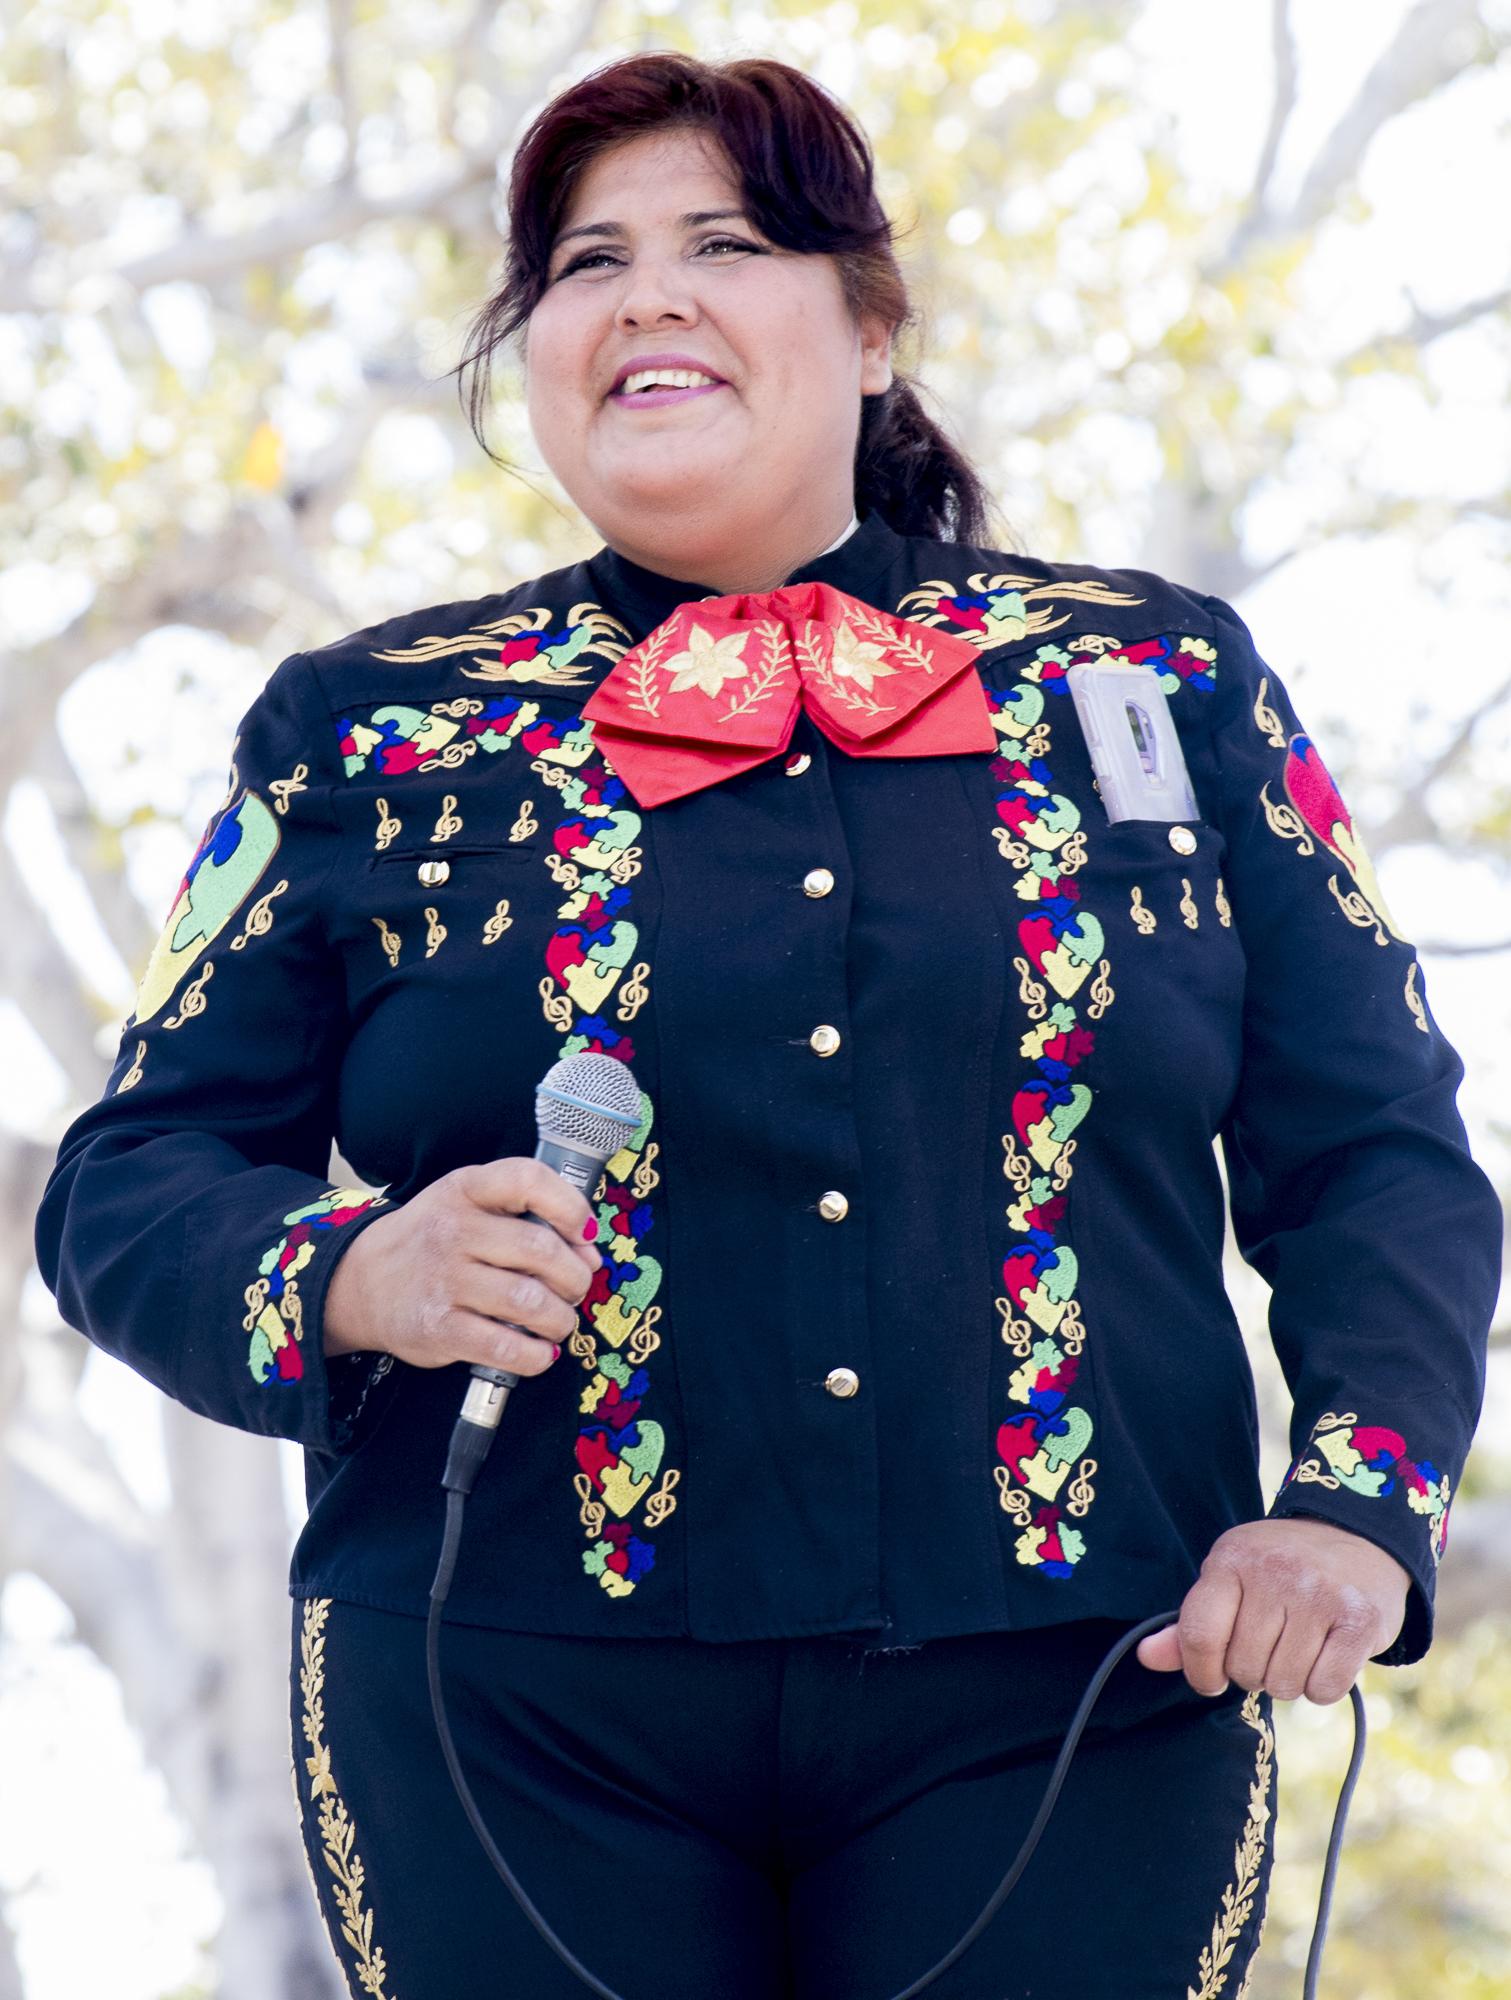 Maricela Ibarra performs traditional hispanic music at Olvera Streets Cinco De Mayo festival on May 5, 2018 in downtown Los Angeles, California (Zane Meyer-Thornton/Corsair Photo)